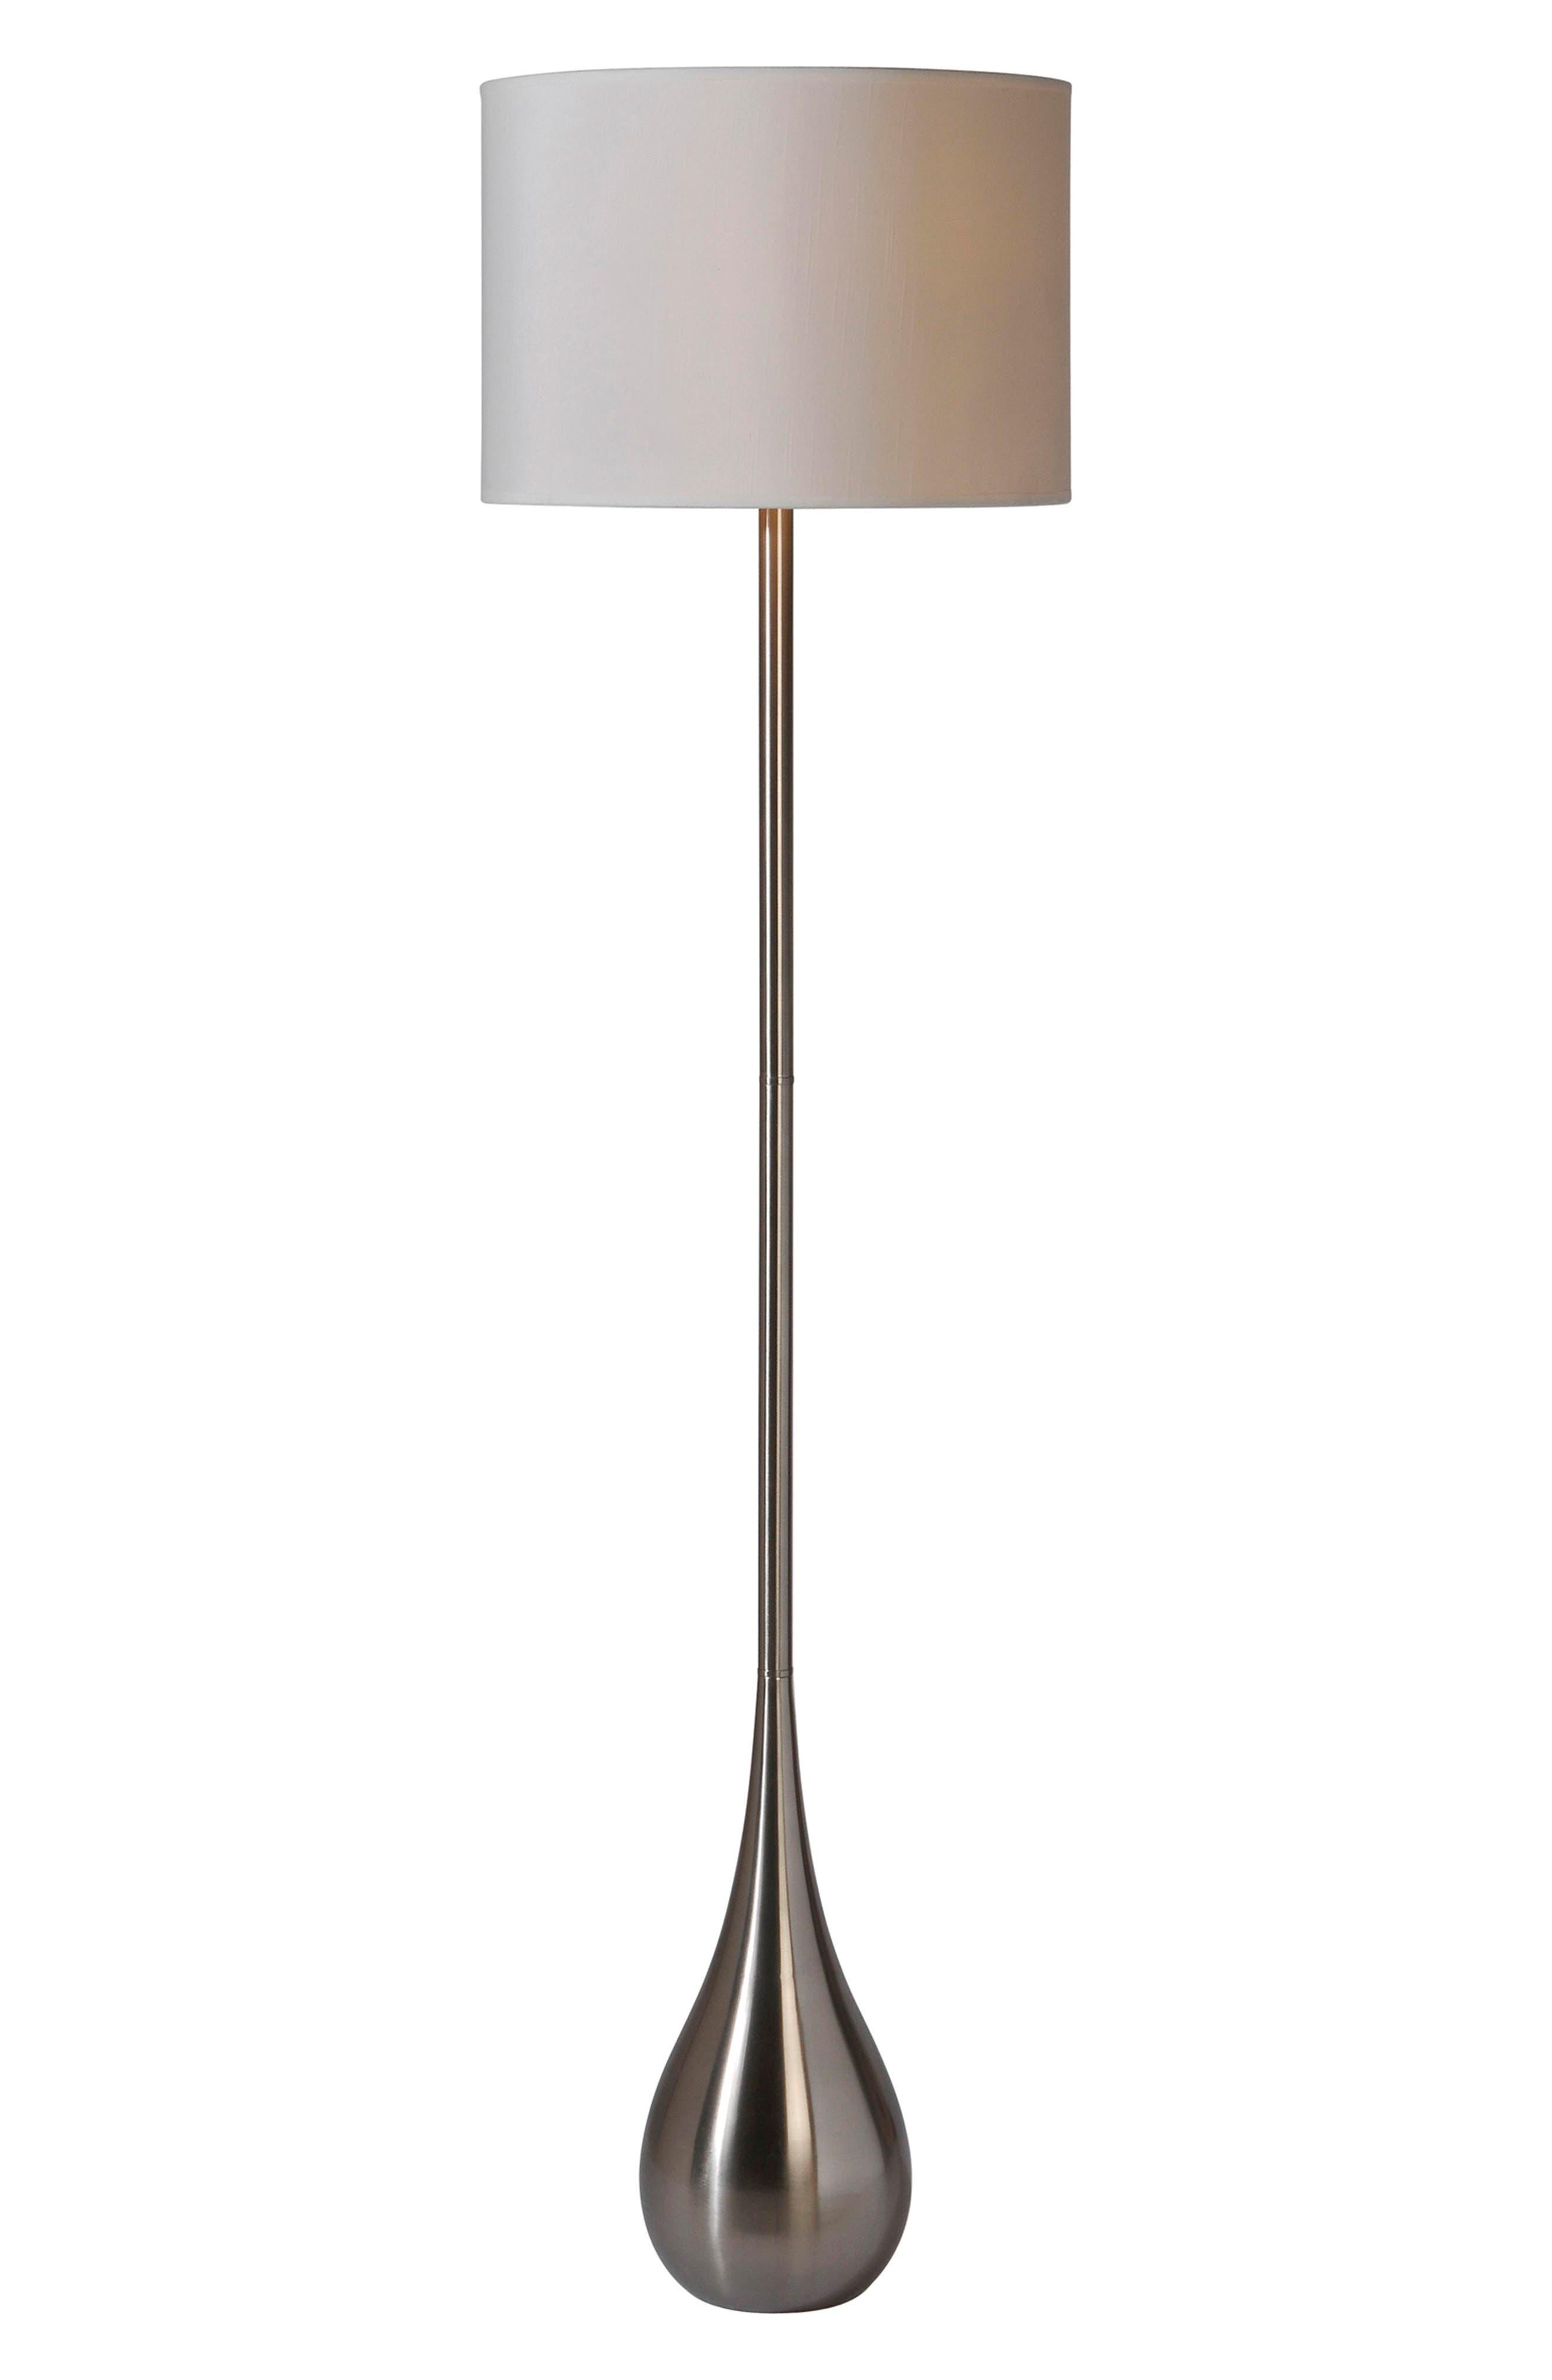 Main Image - Renwil Satin Nickel Floor Lamp